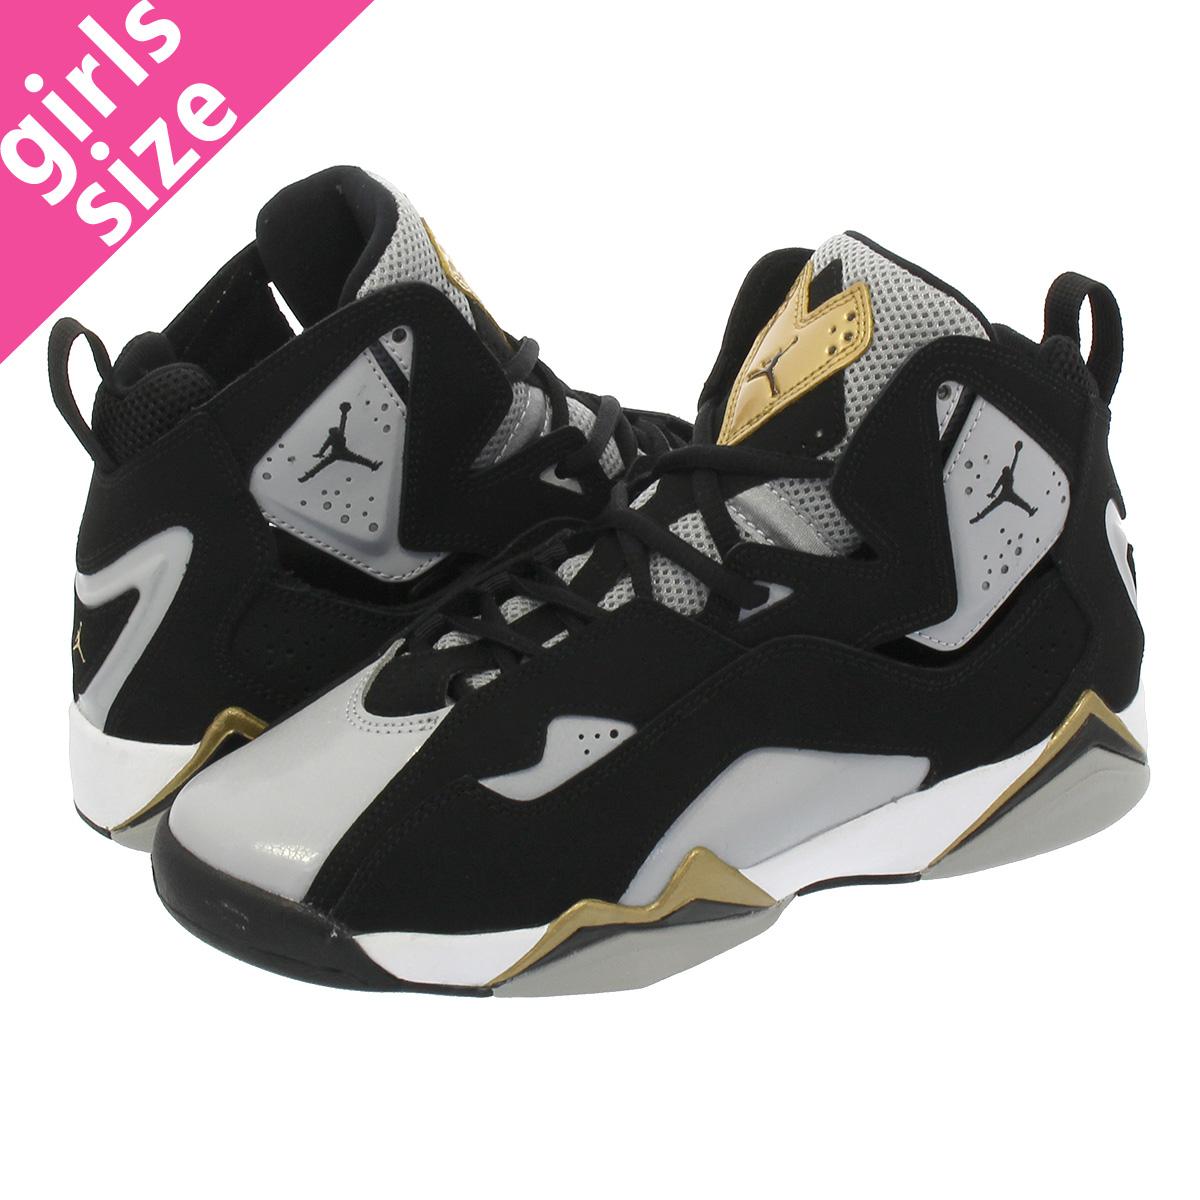 NIKE JORDAN TRUE FLIGHT GS Nike Jordan toe roof light GS BLACK BLACK WOLF  GREY WHITE fc0563918